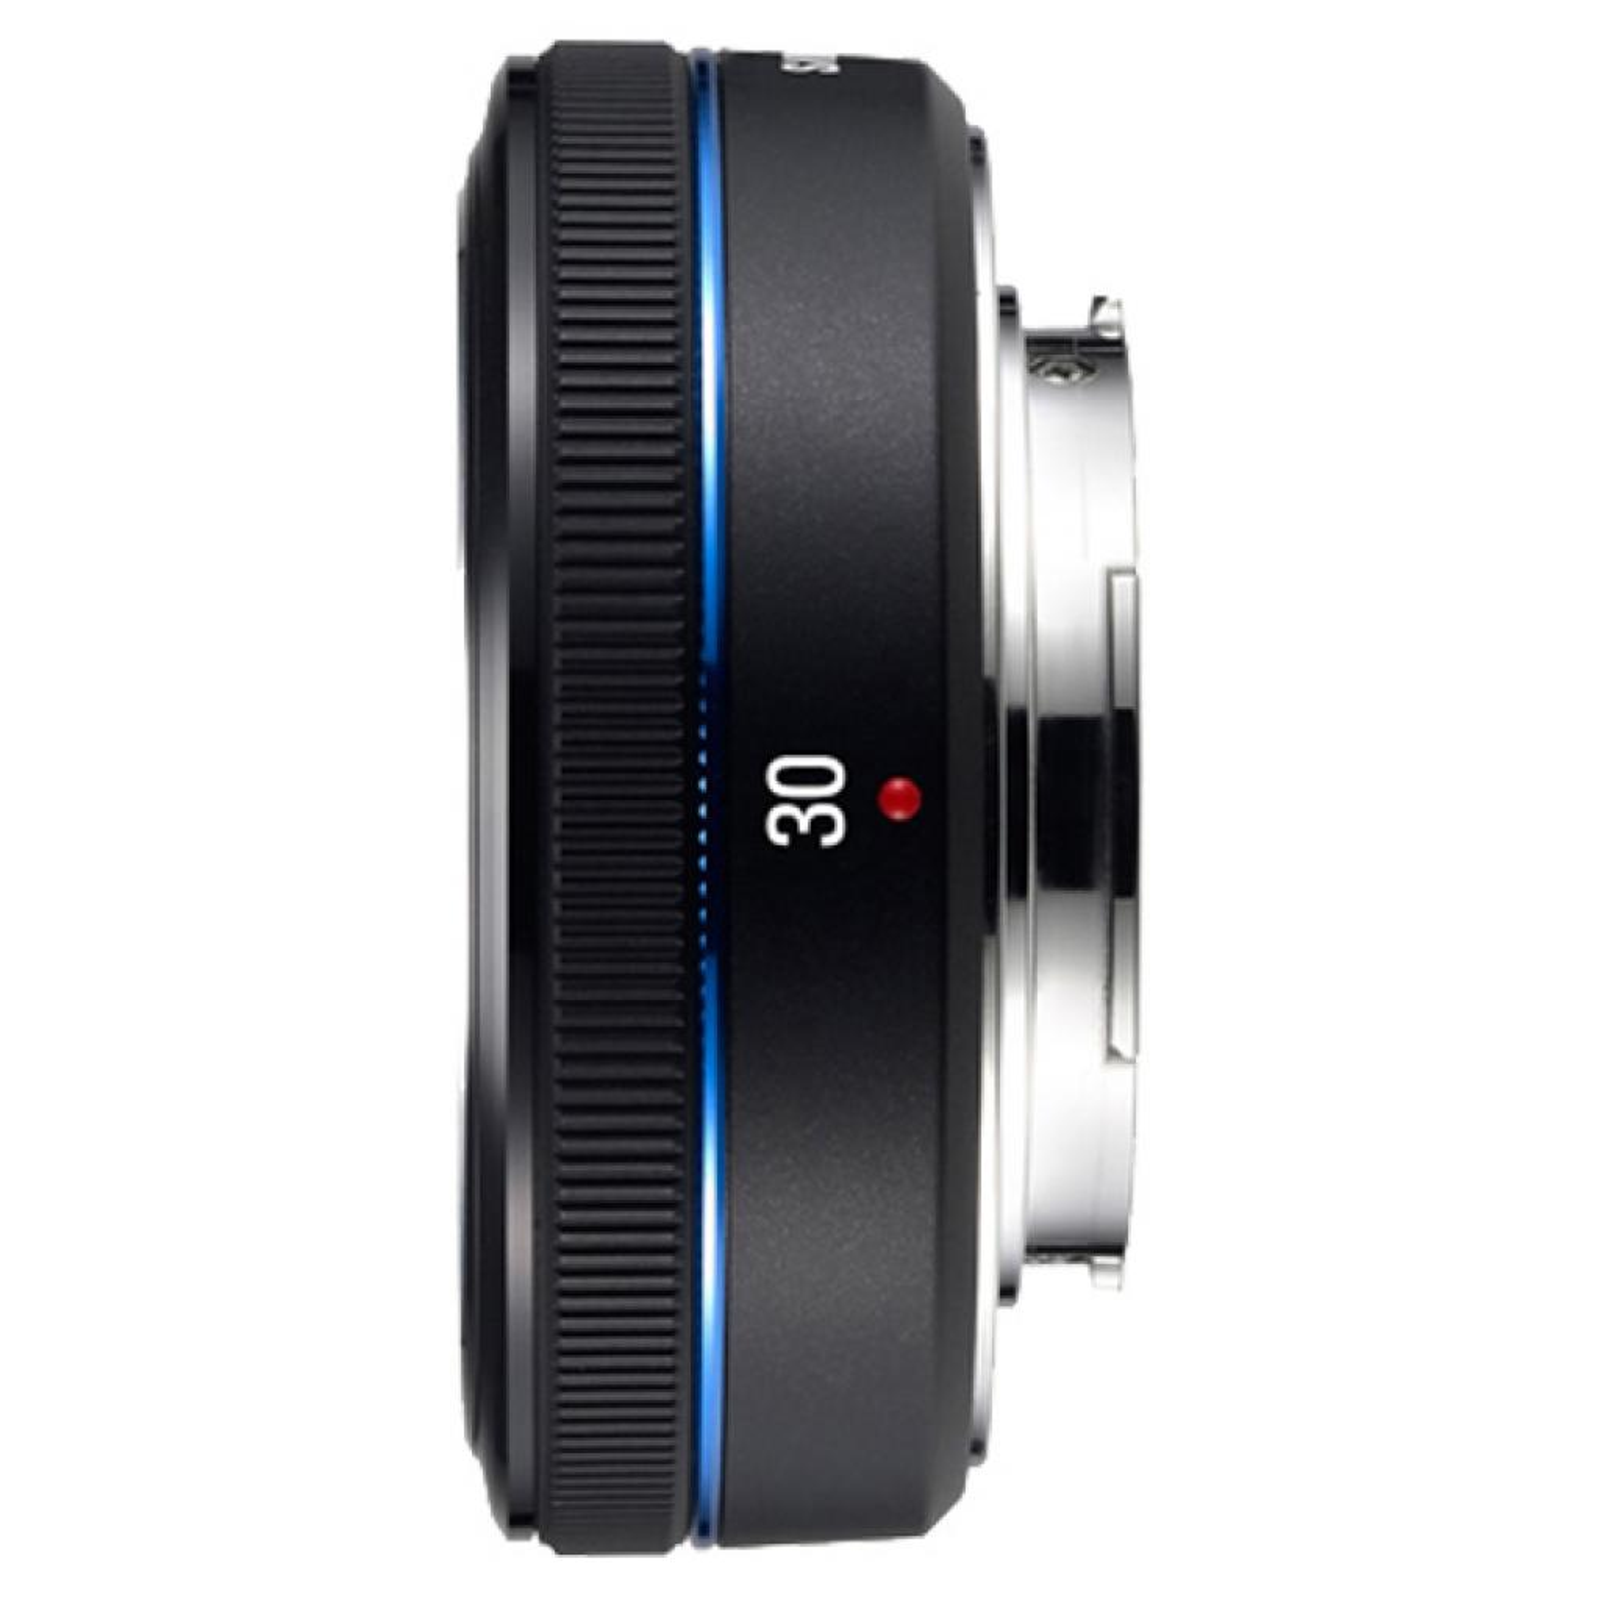 Объектив Samsung EX-S30NB 30mm F2 (EX-S30NB) изображение 3